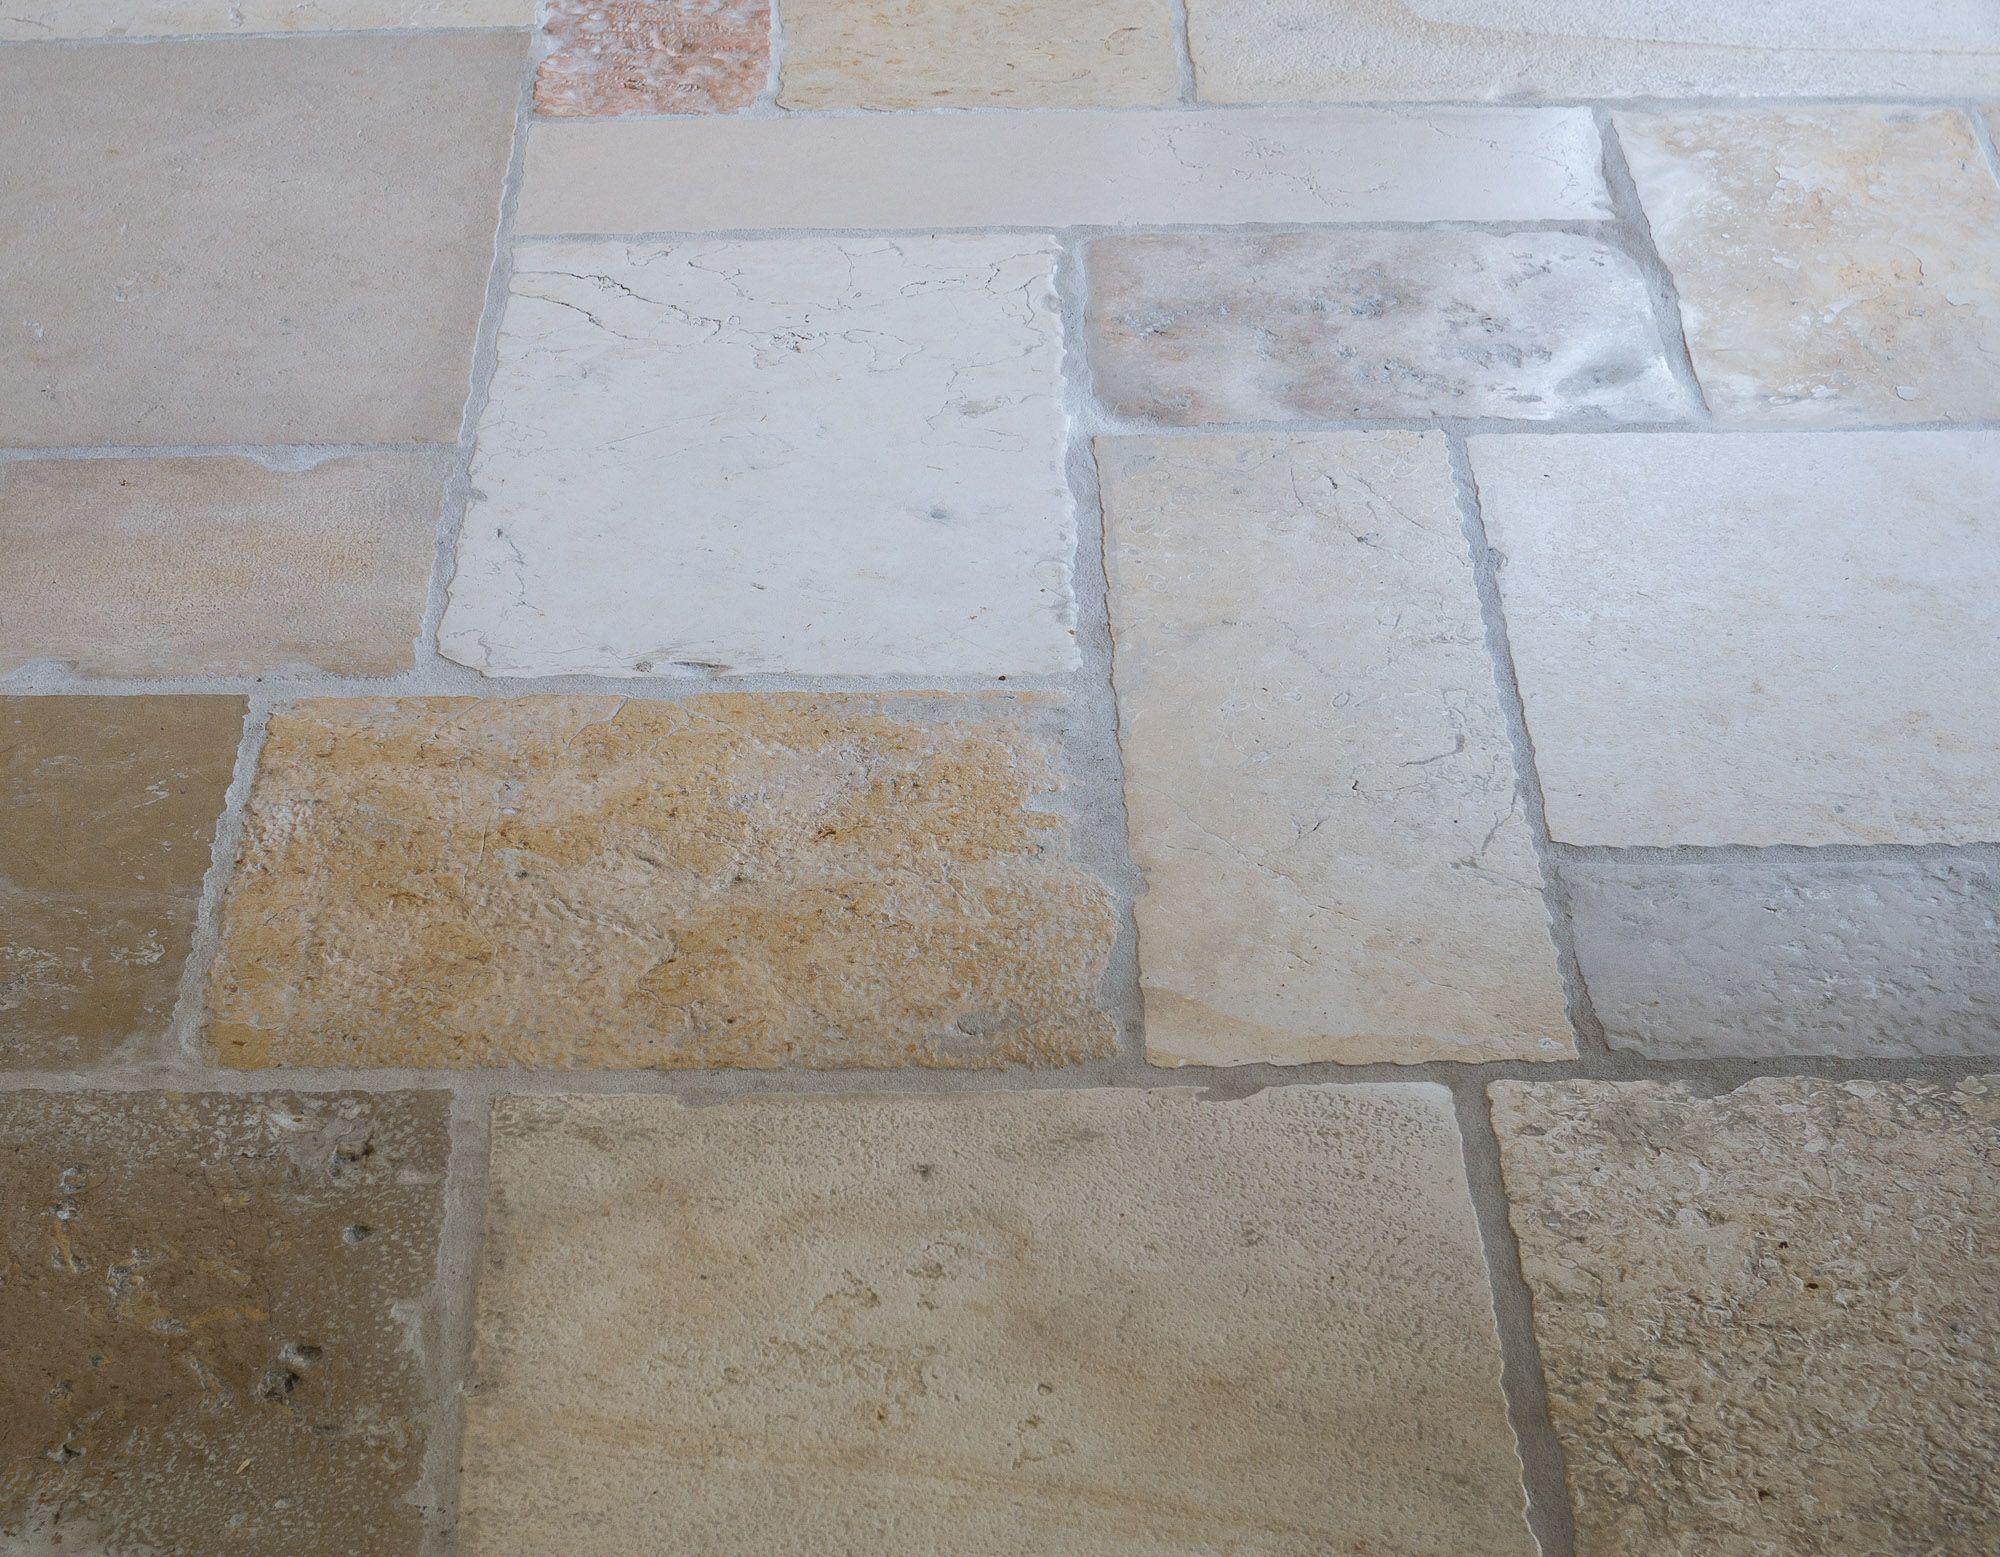 Generous 12 X 24 Ceramic Tile Thick 12X12 Vinyl Floor Tiles Round 2X4 Ceiling Tiles Cheap 3X6 White Subway Tile Lowes Old 4 X 4 Ceramic Wall Tile Black6X6 Ceramic Tile Jerusalem Reclaimed Stone Flooring. Historic Stone Tiles ..